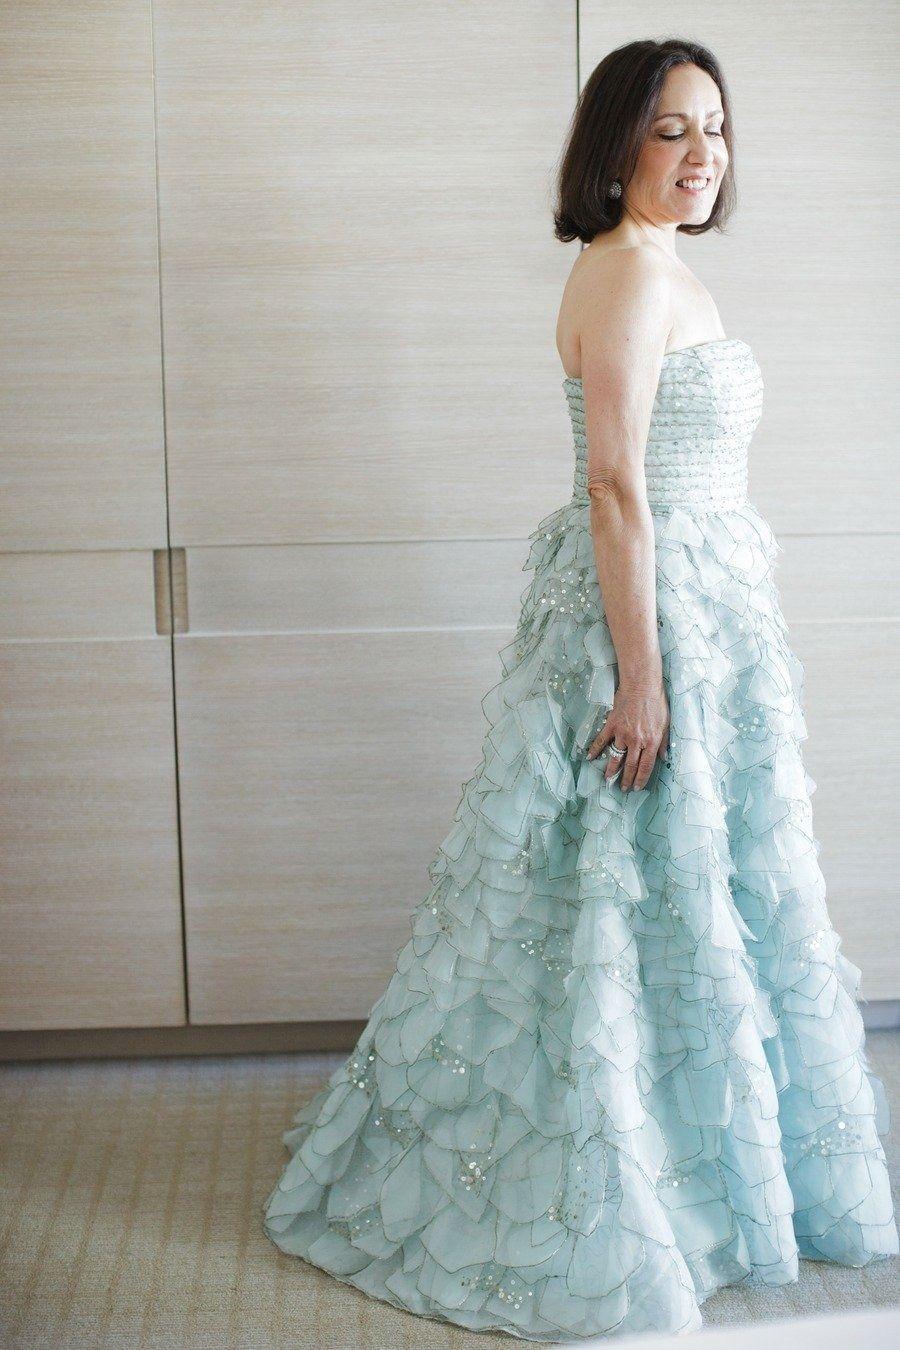 Famous Oscar Dela Renta Wedding Gowns Composition - All Wedding ...